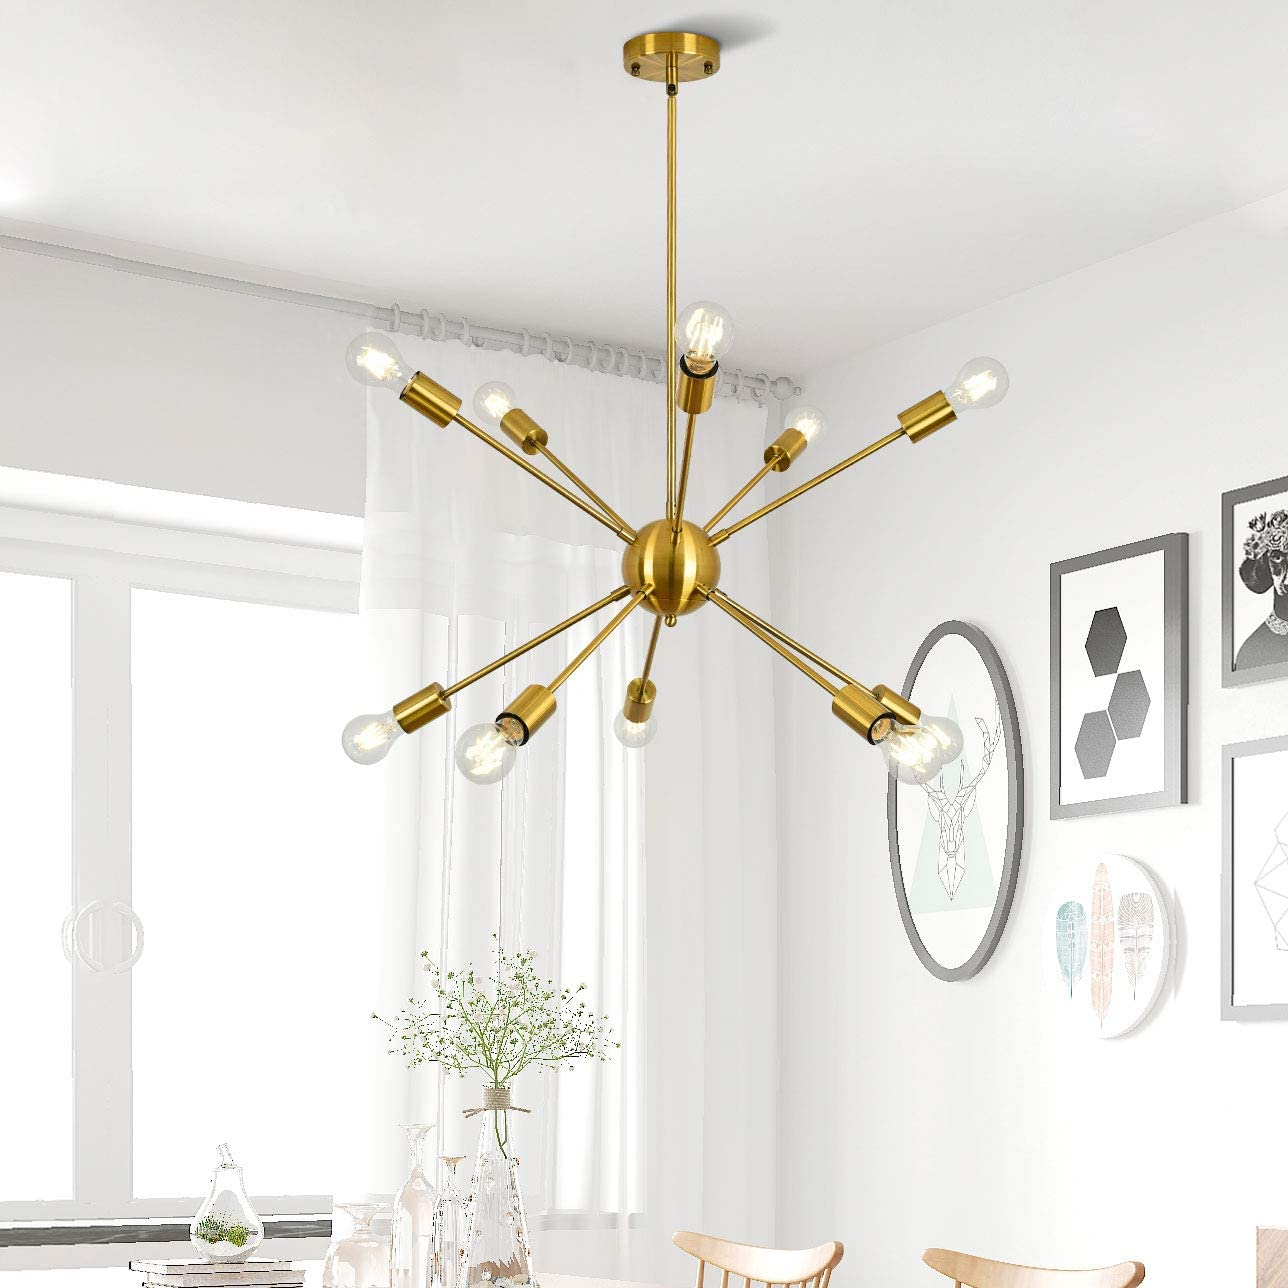 Sputnik Chandeliers 10 Lights Brass Modern Pendant Lighting Mid Century Ceiling Light Fixture for Kitchen Living Room Bedroom